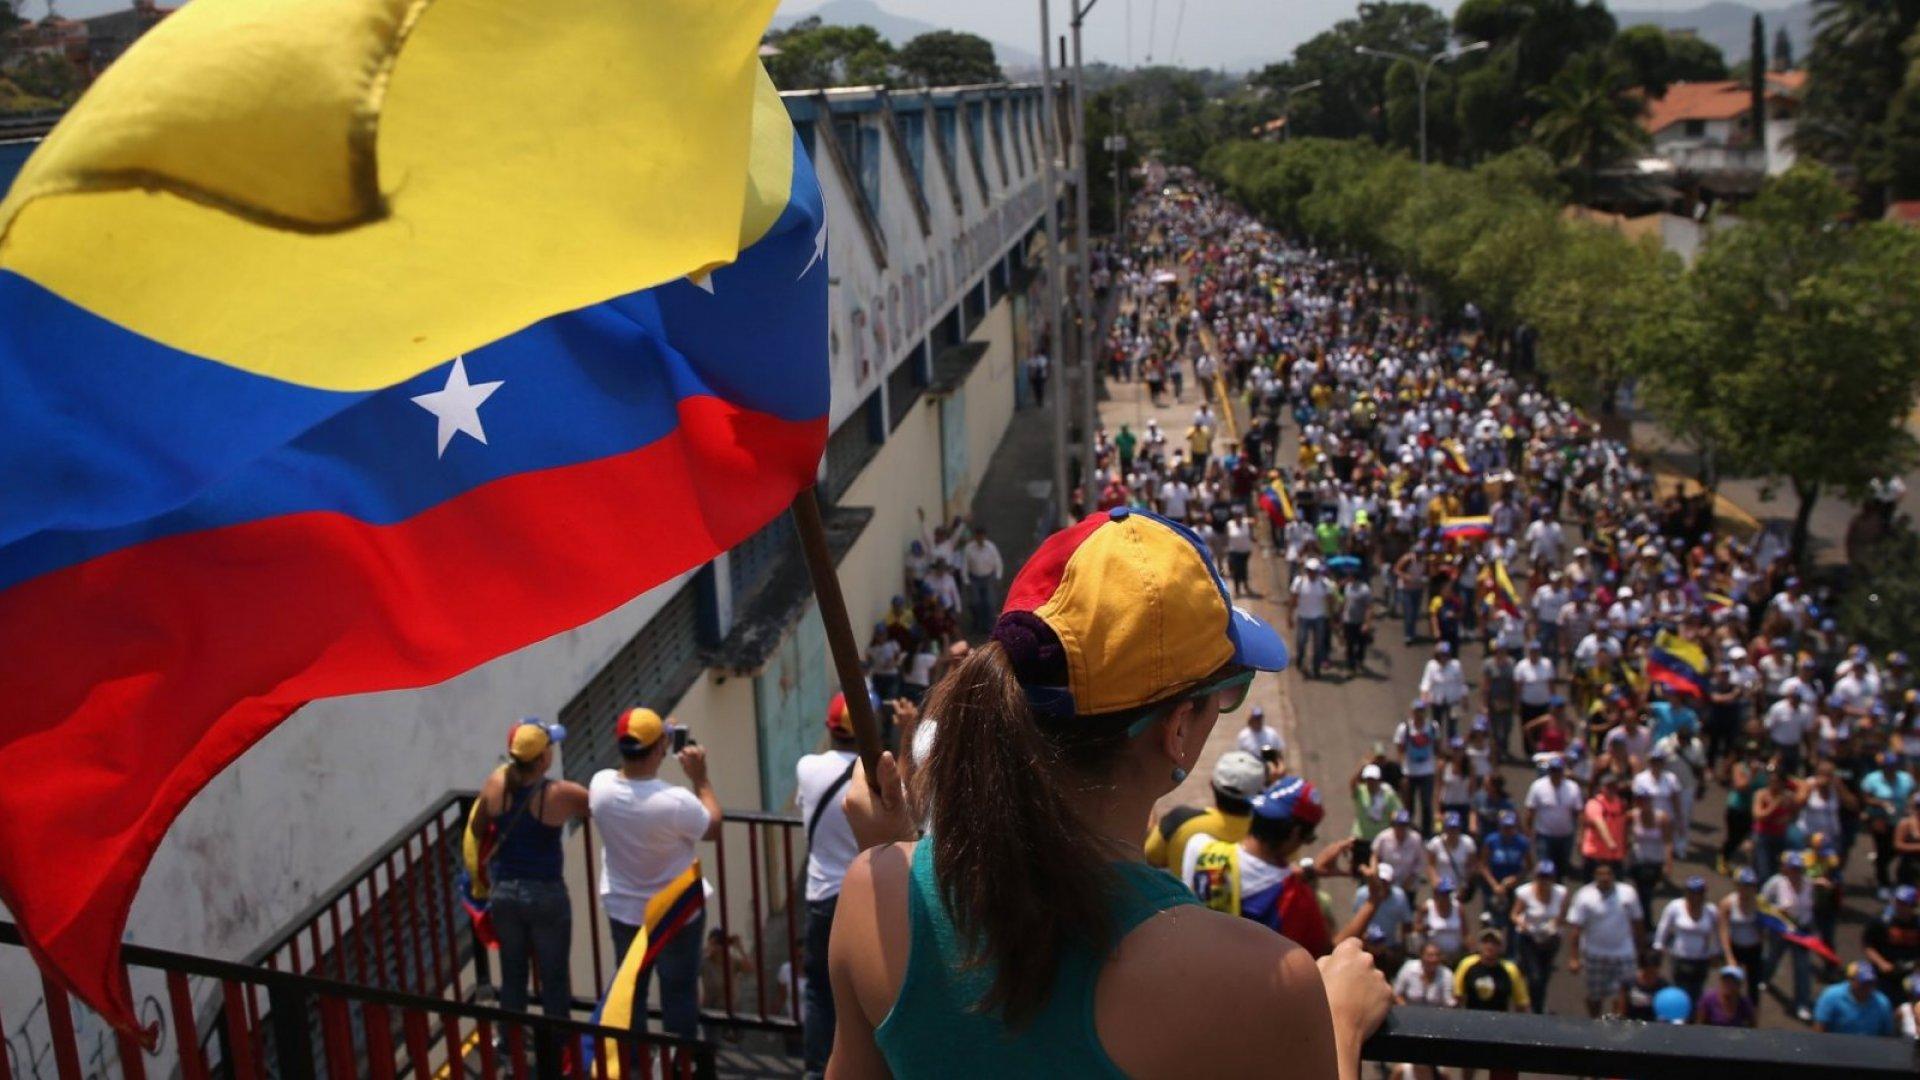 Anti-government protestors march through San Cristobal, Venezuela last year.